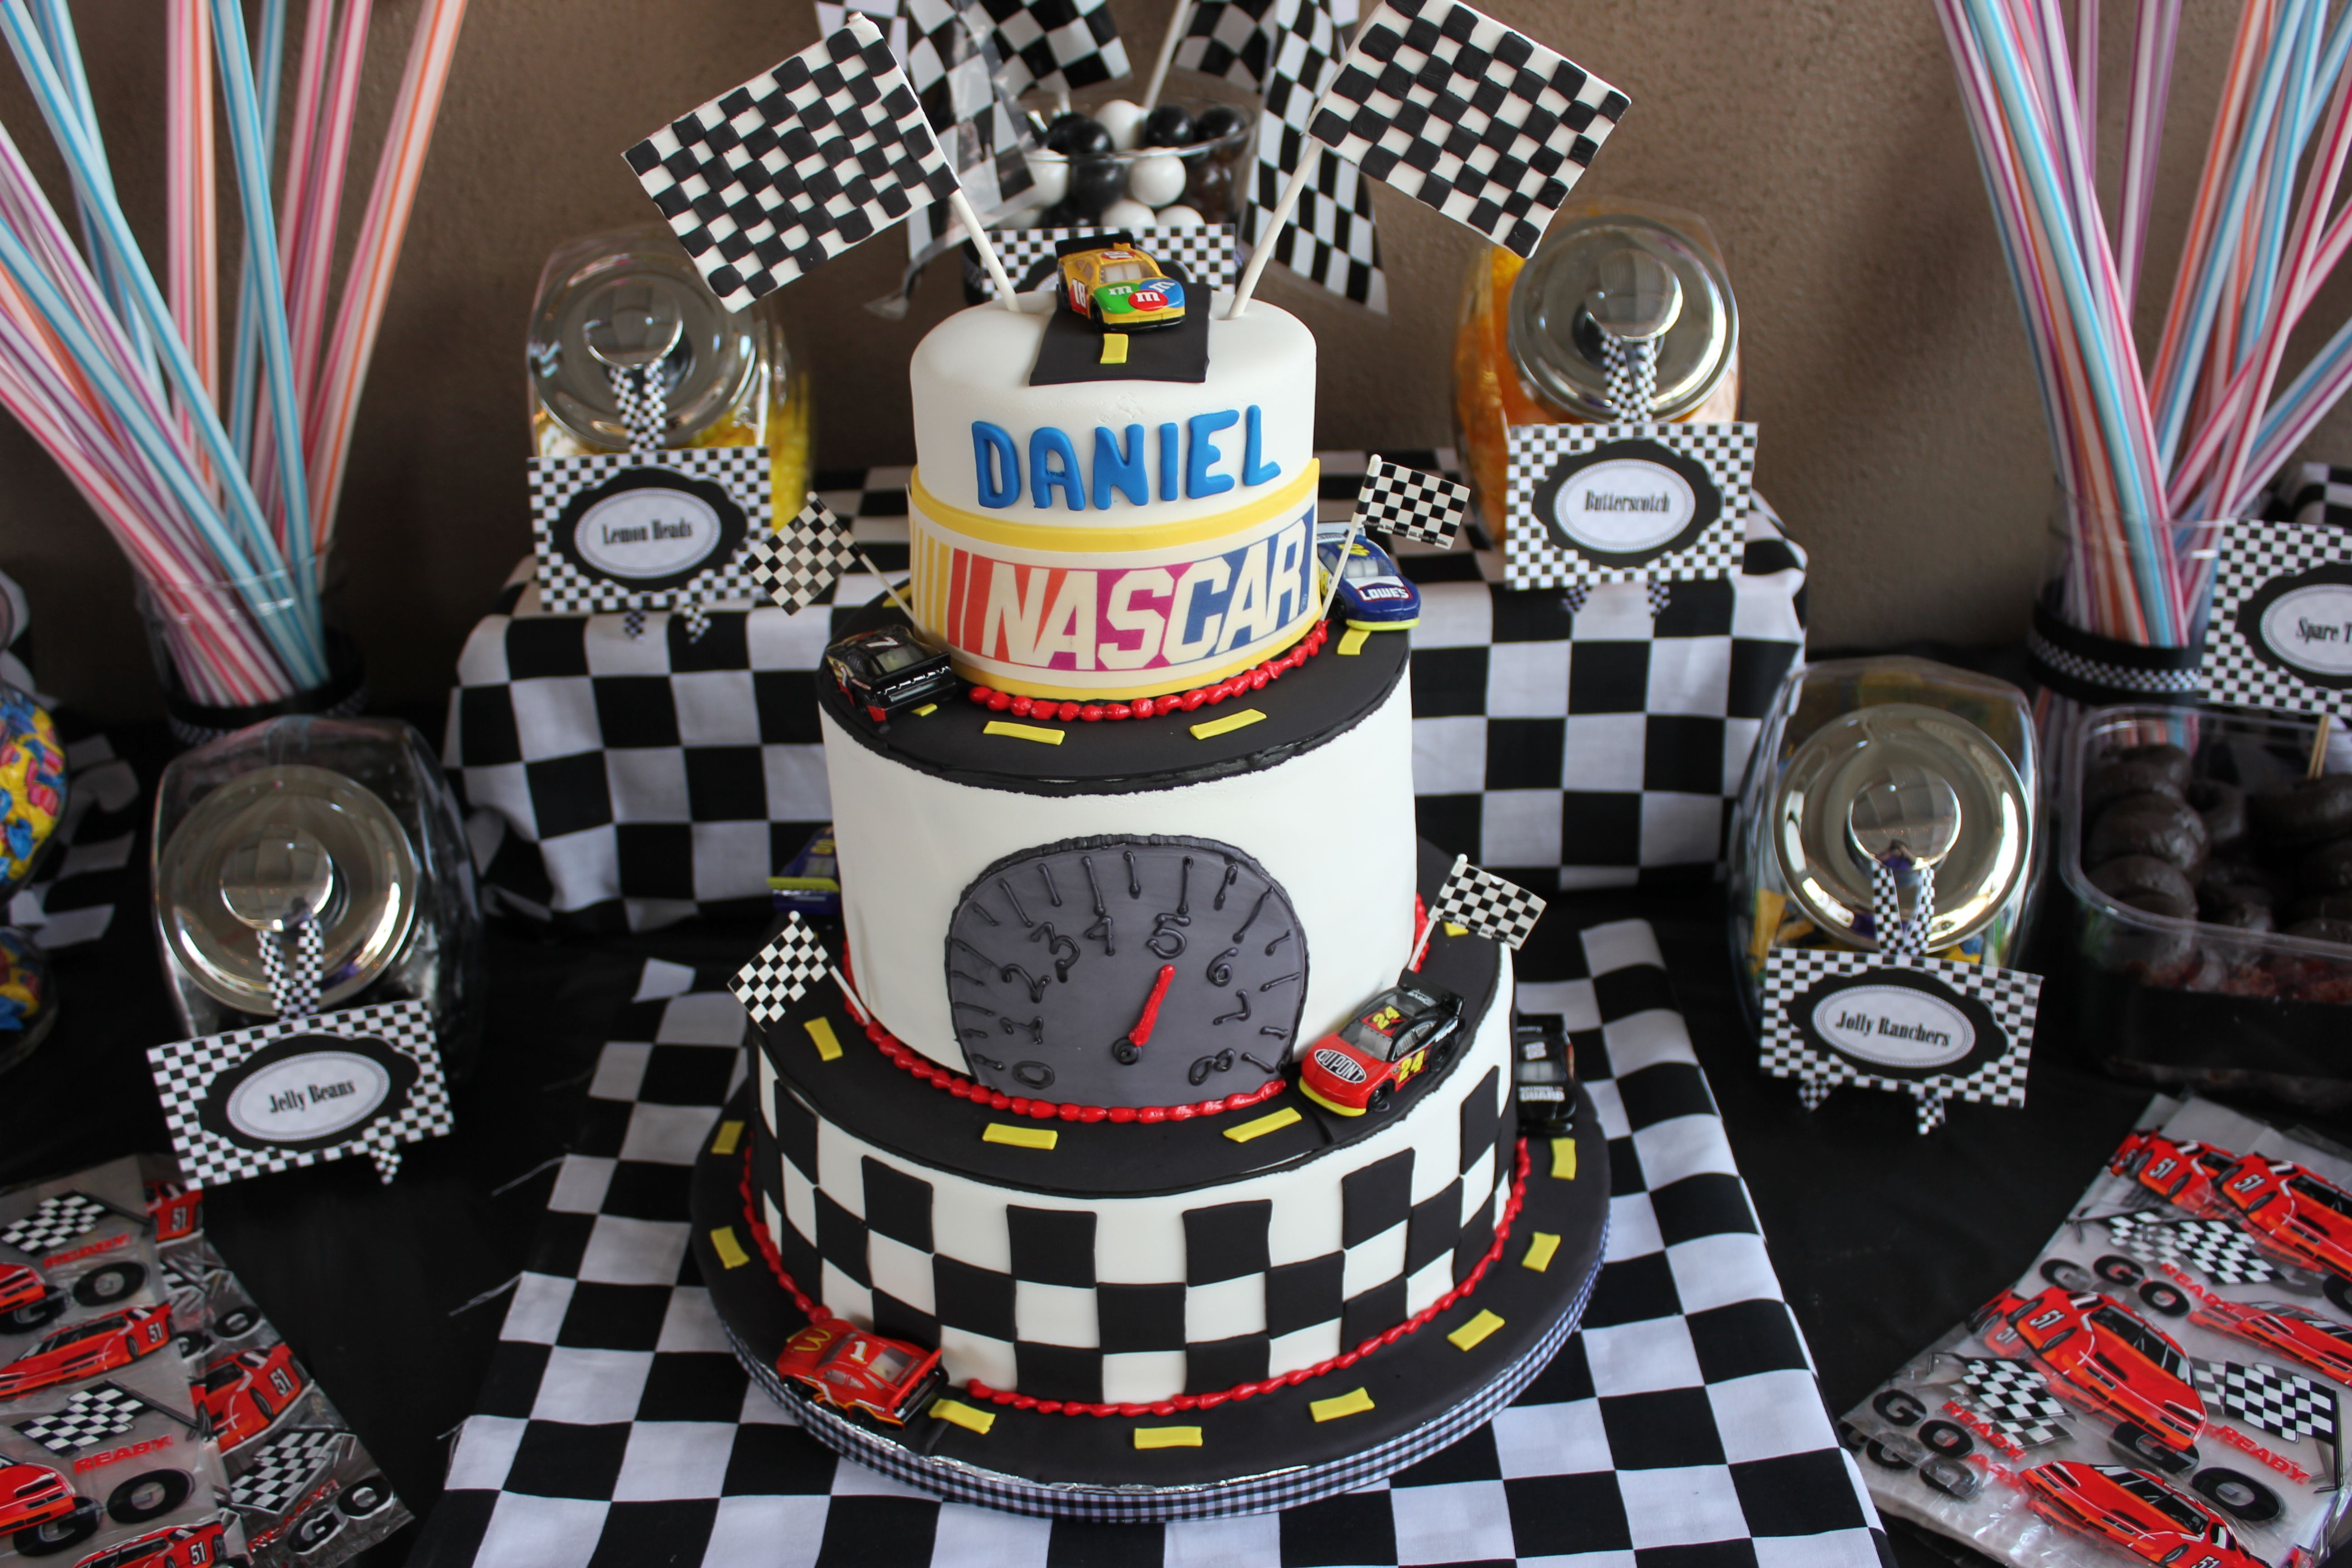 Nascar Birthday Cake. Laura Banderas-avalos